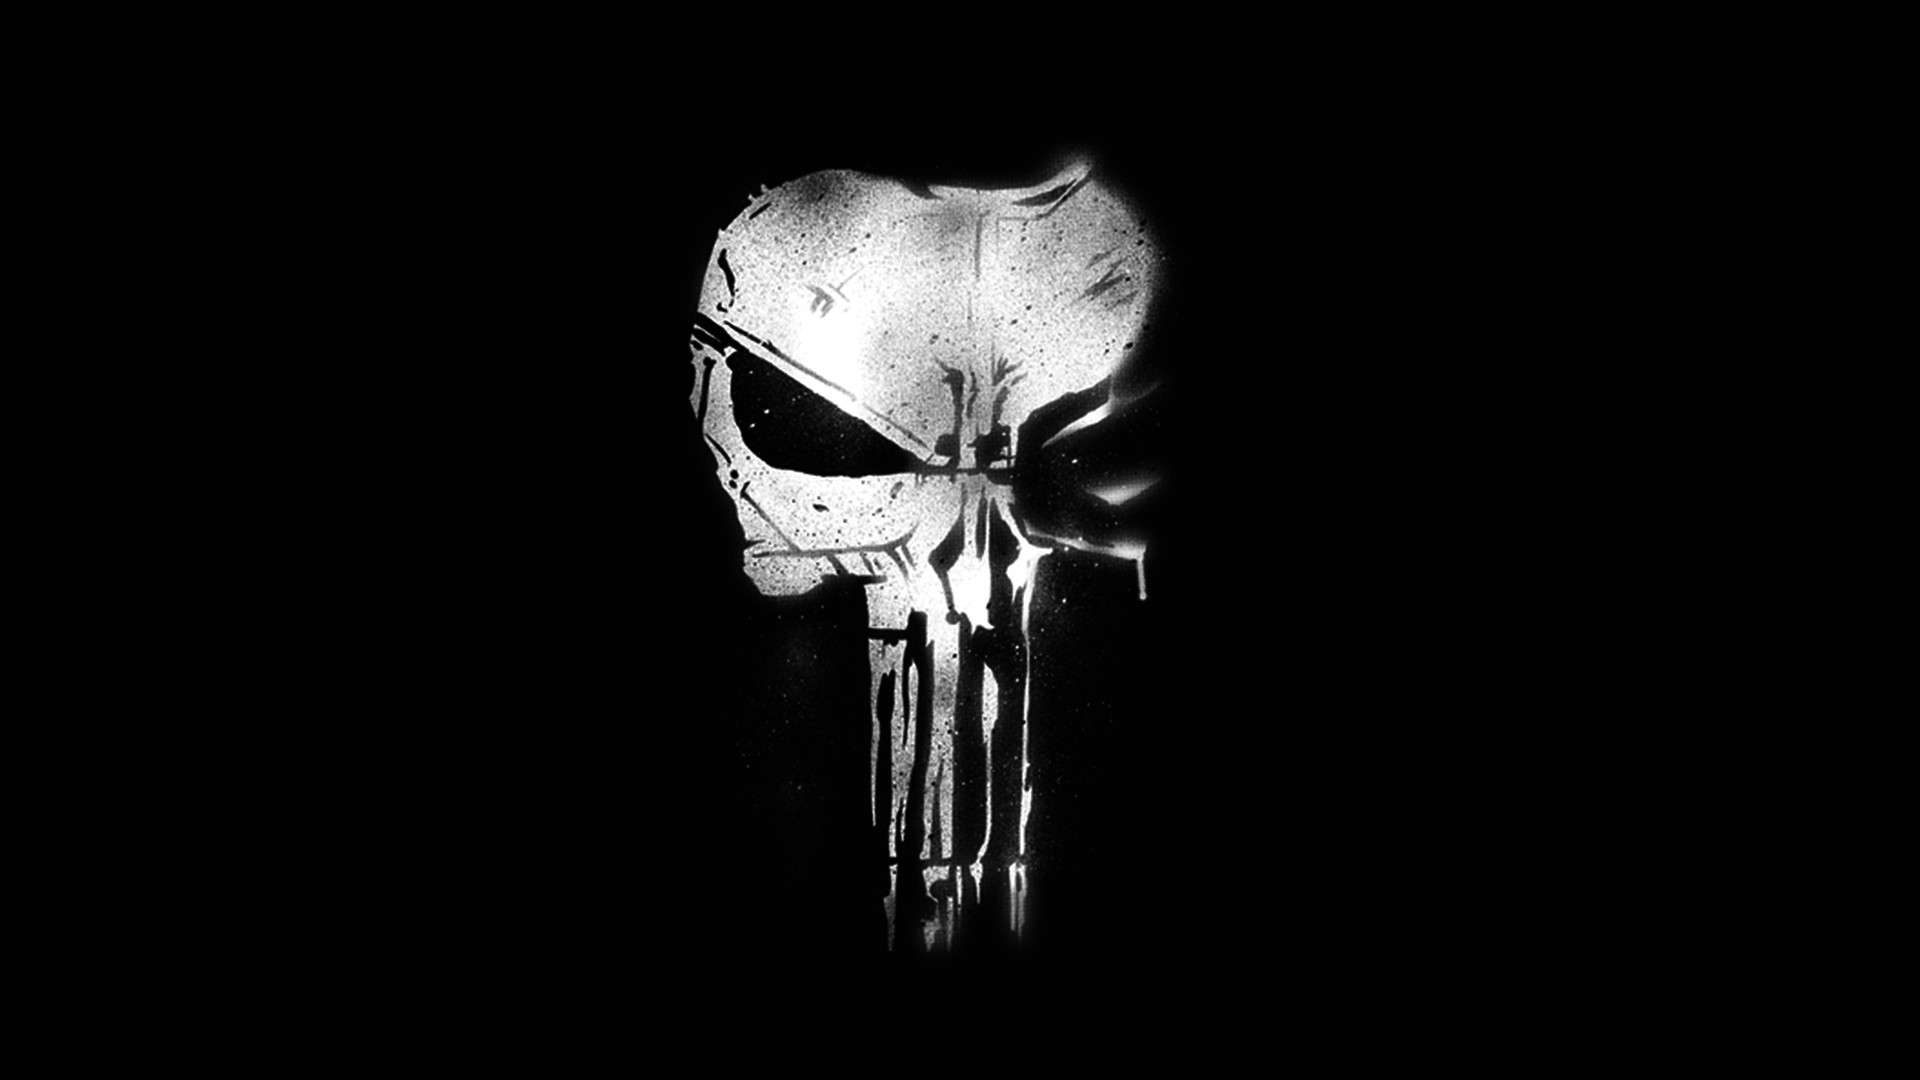 The punisher wallpaper 70 images - Skull 4k images ...